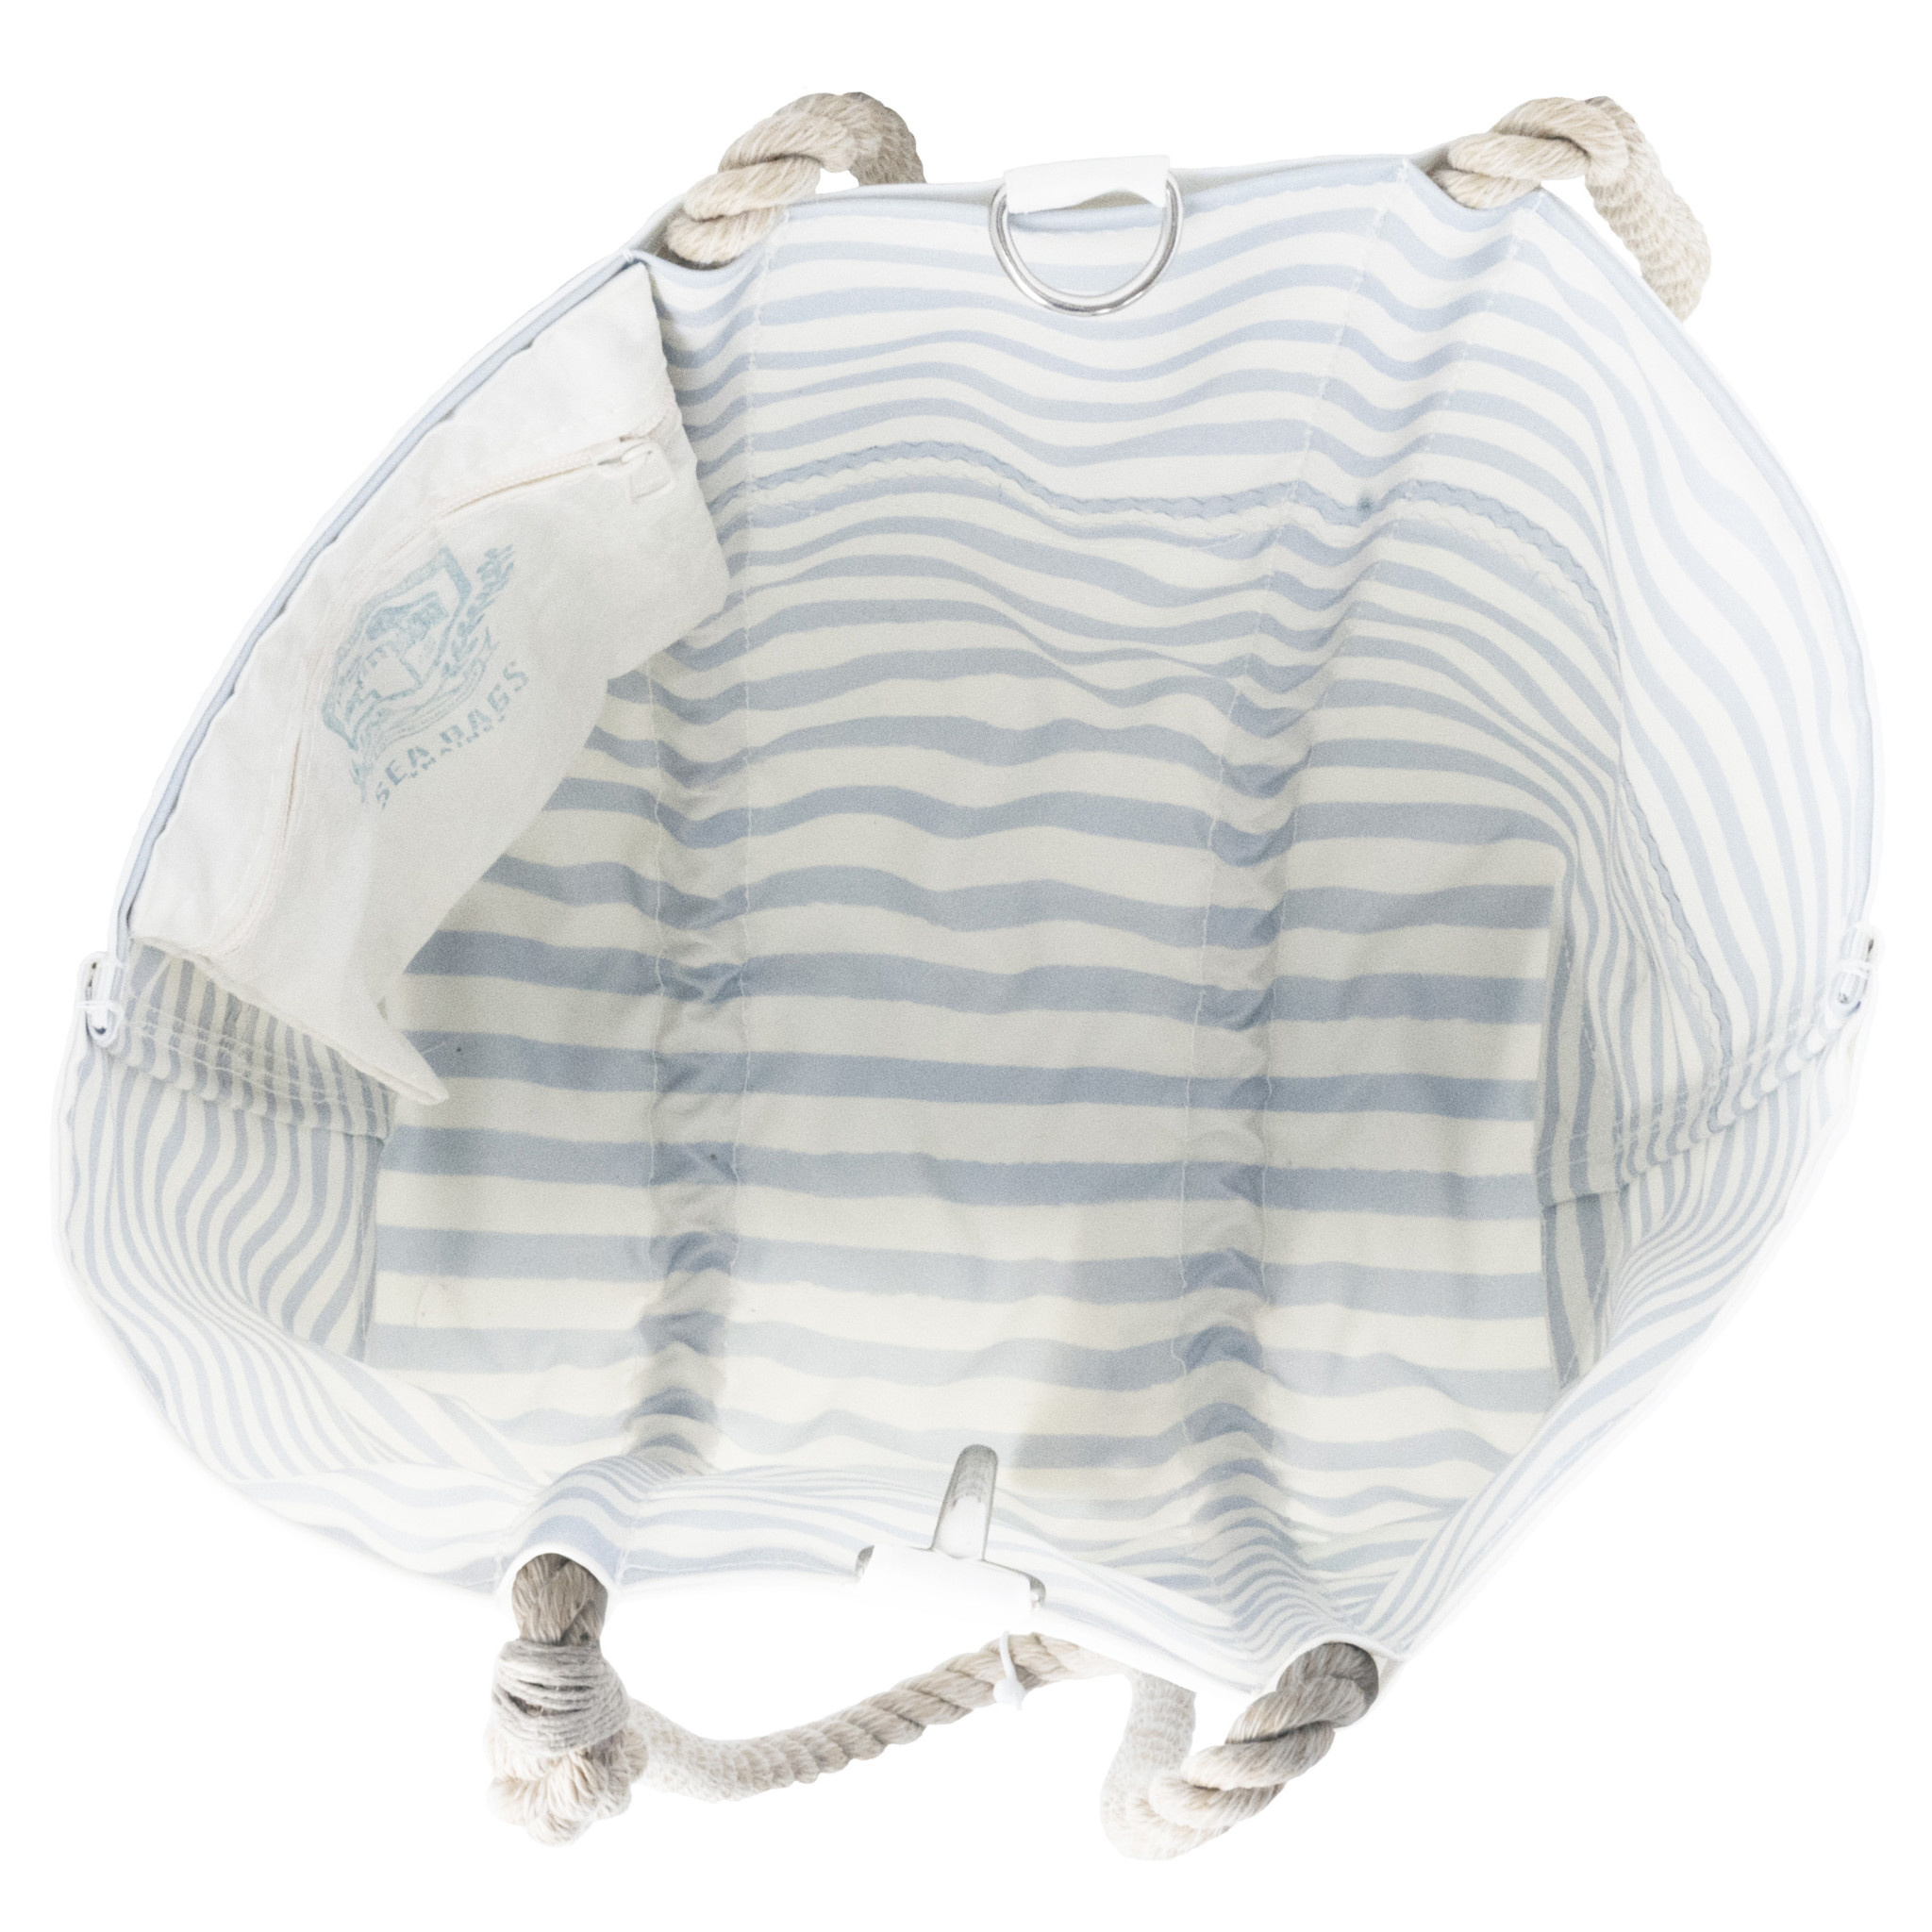 Sea Bags Sara Fitz Hydrangea Pattern Tote - Medium with Clasp